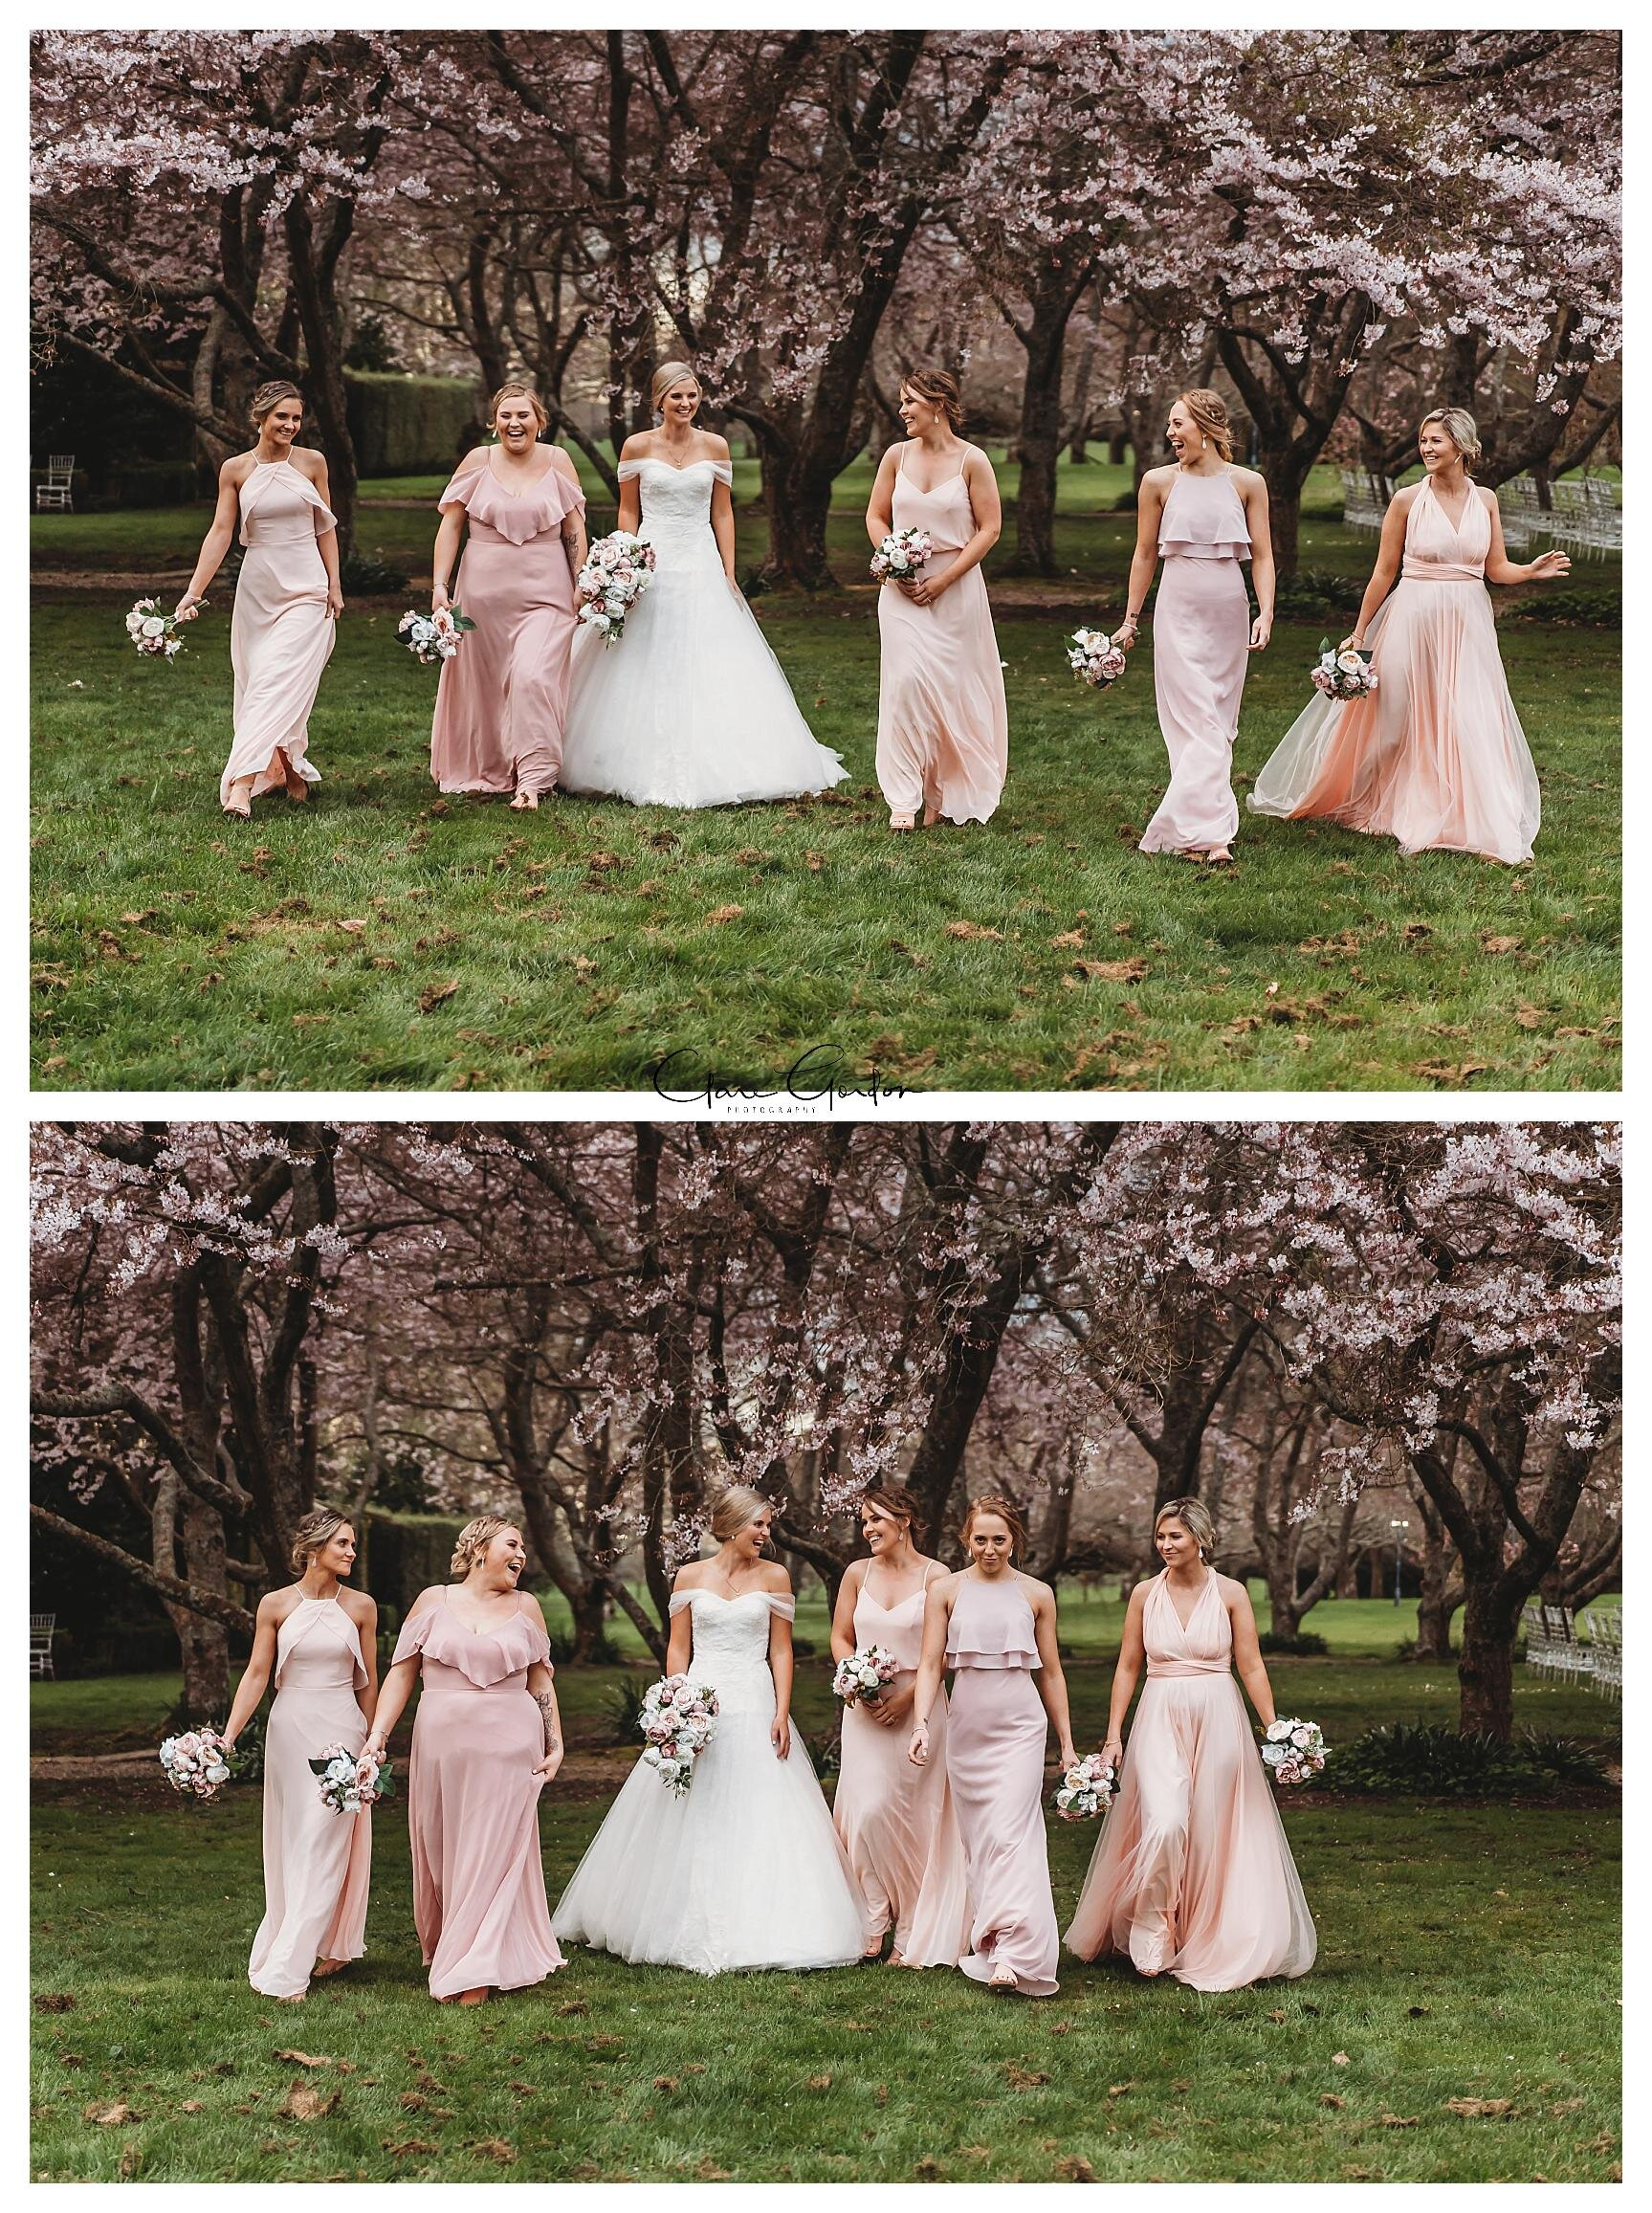 Henley-Hotel-Cherry-blossom-wedding-photos (66).jpg